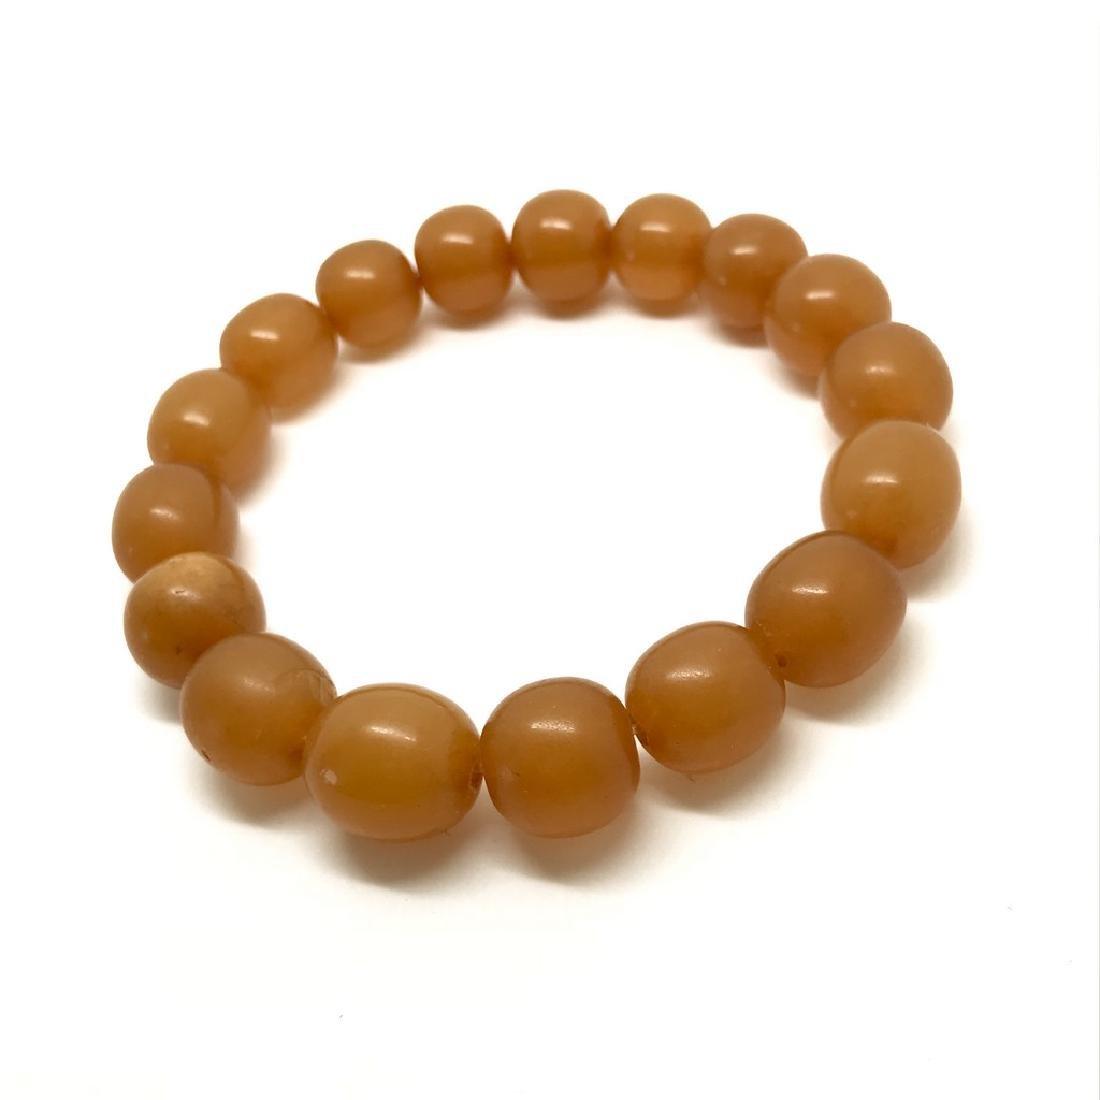 Vintage bracelet Baltic amber butterscotch beads - 2